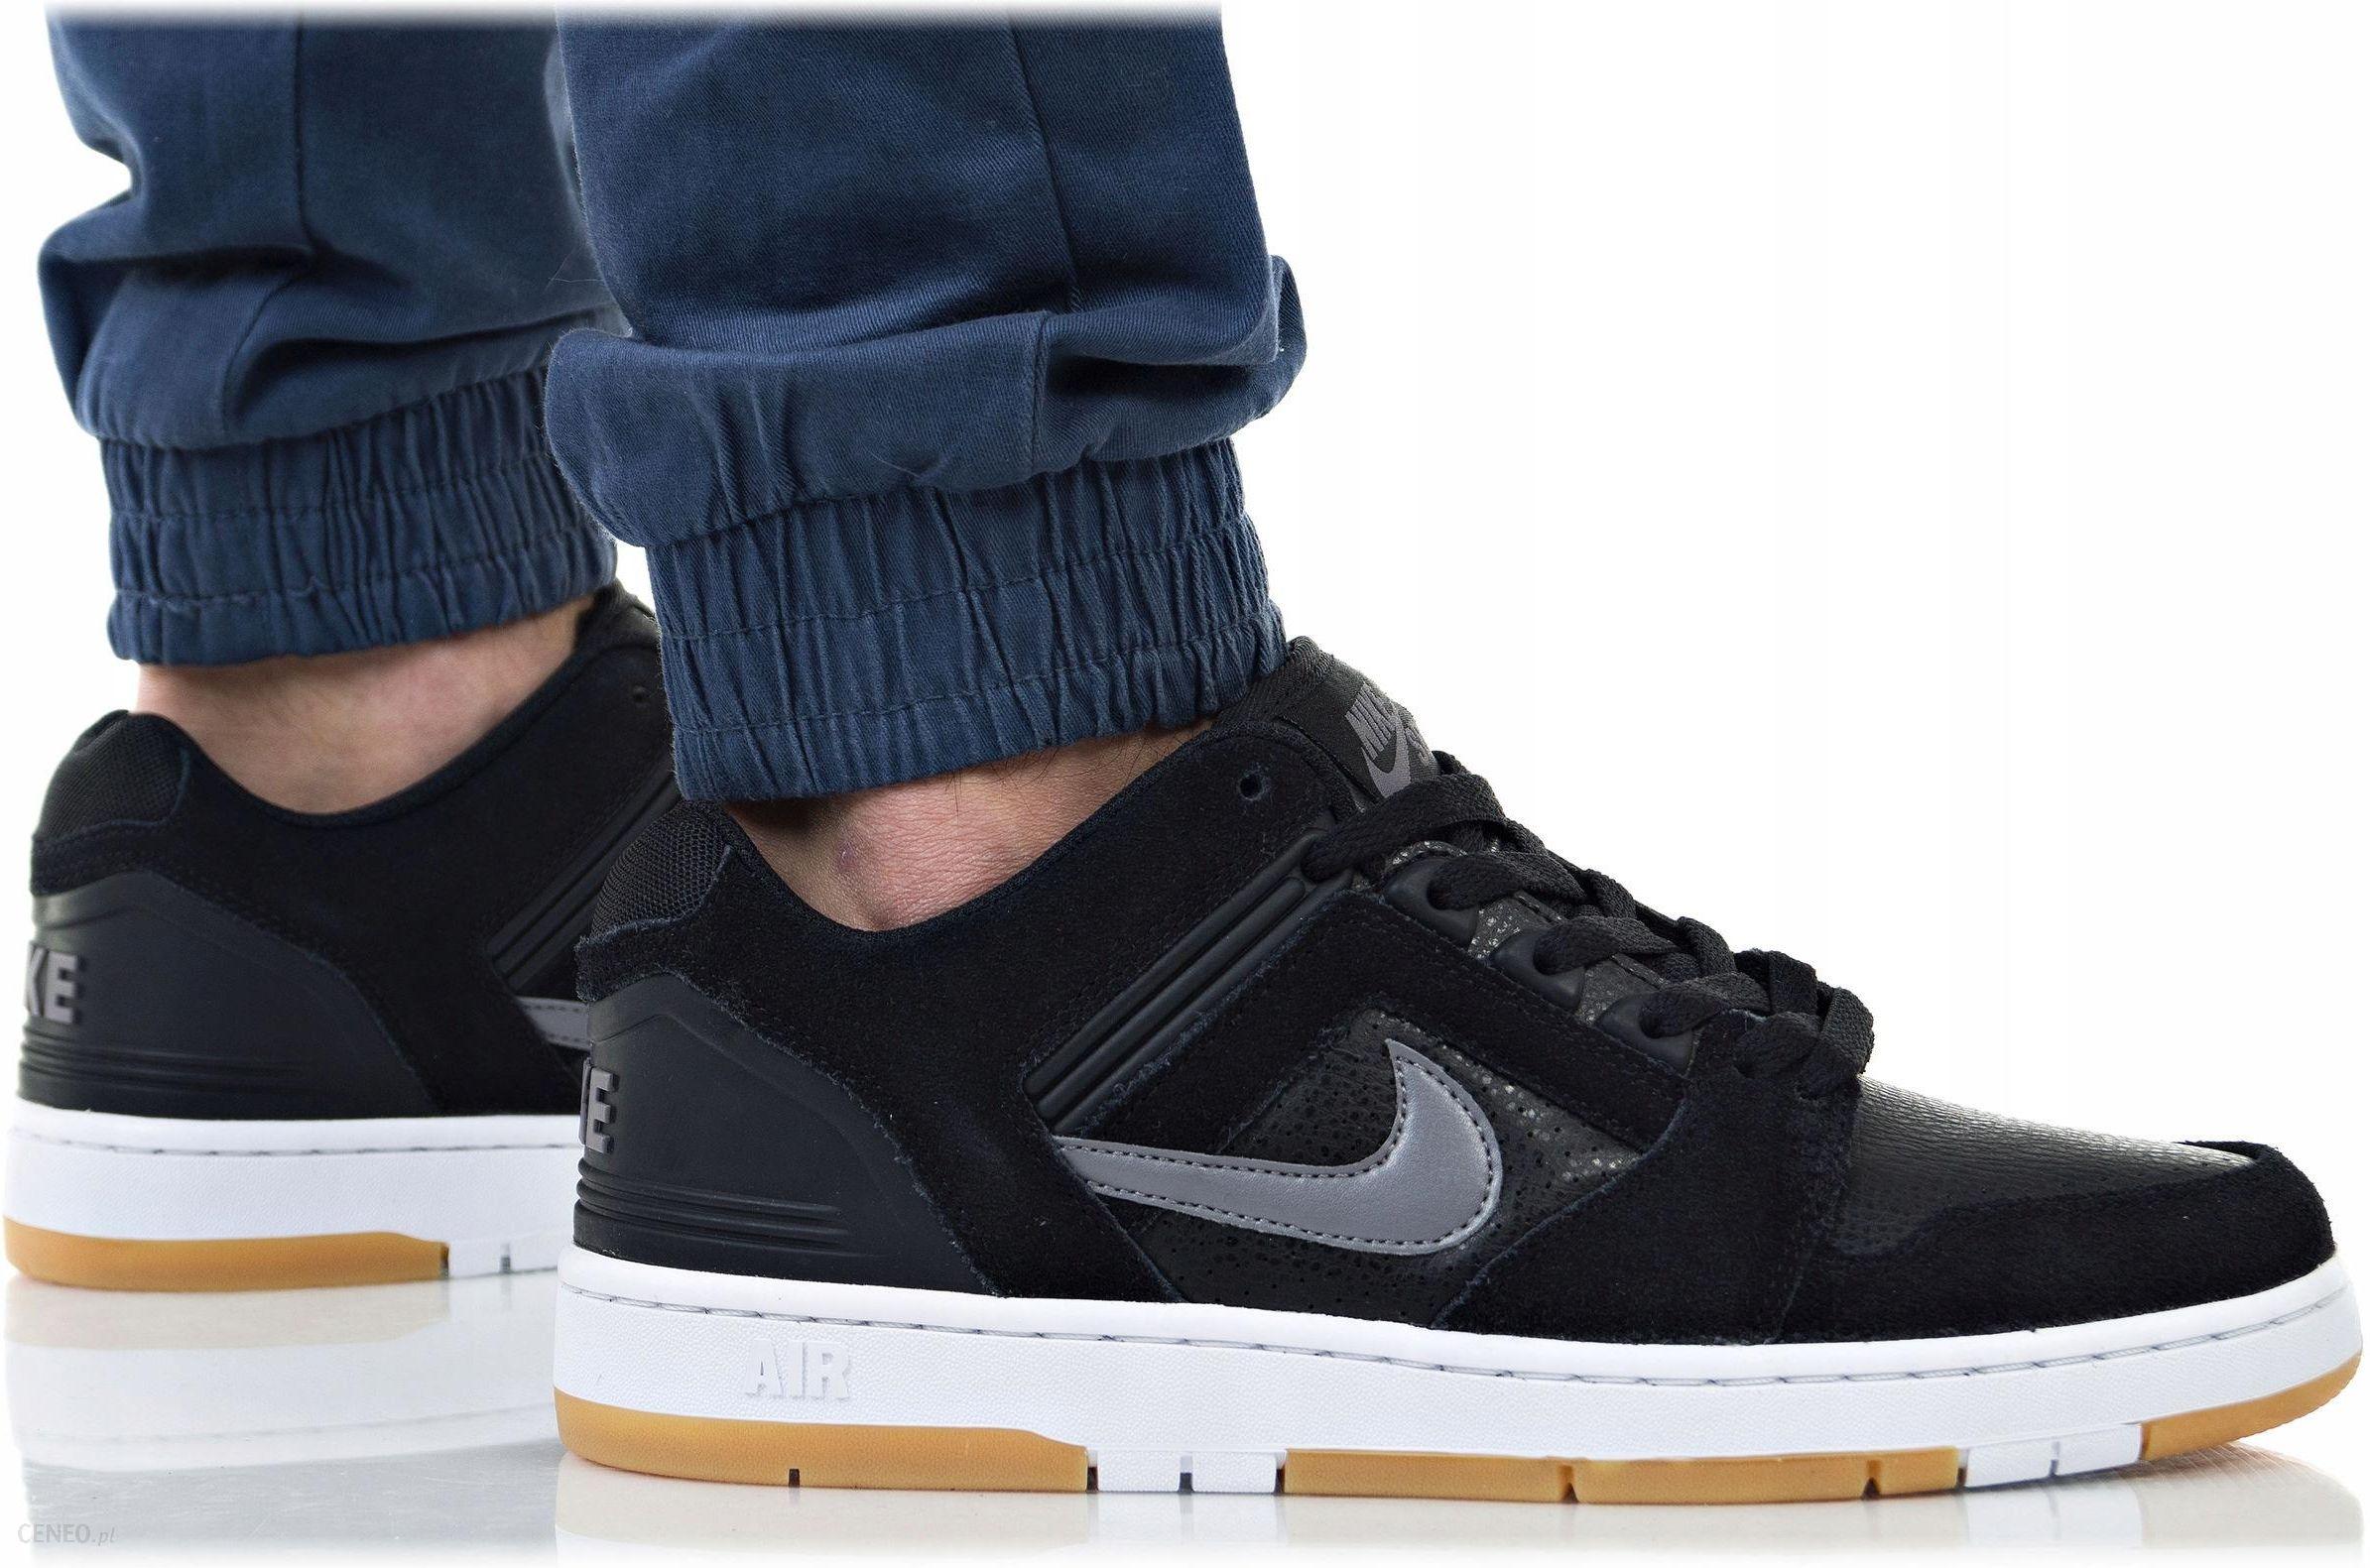 Buty męskie Nike SB AIR FORCE II LOW AO0300 001